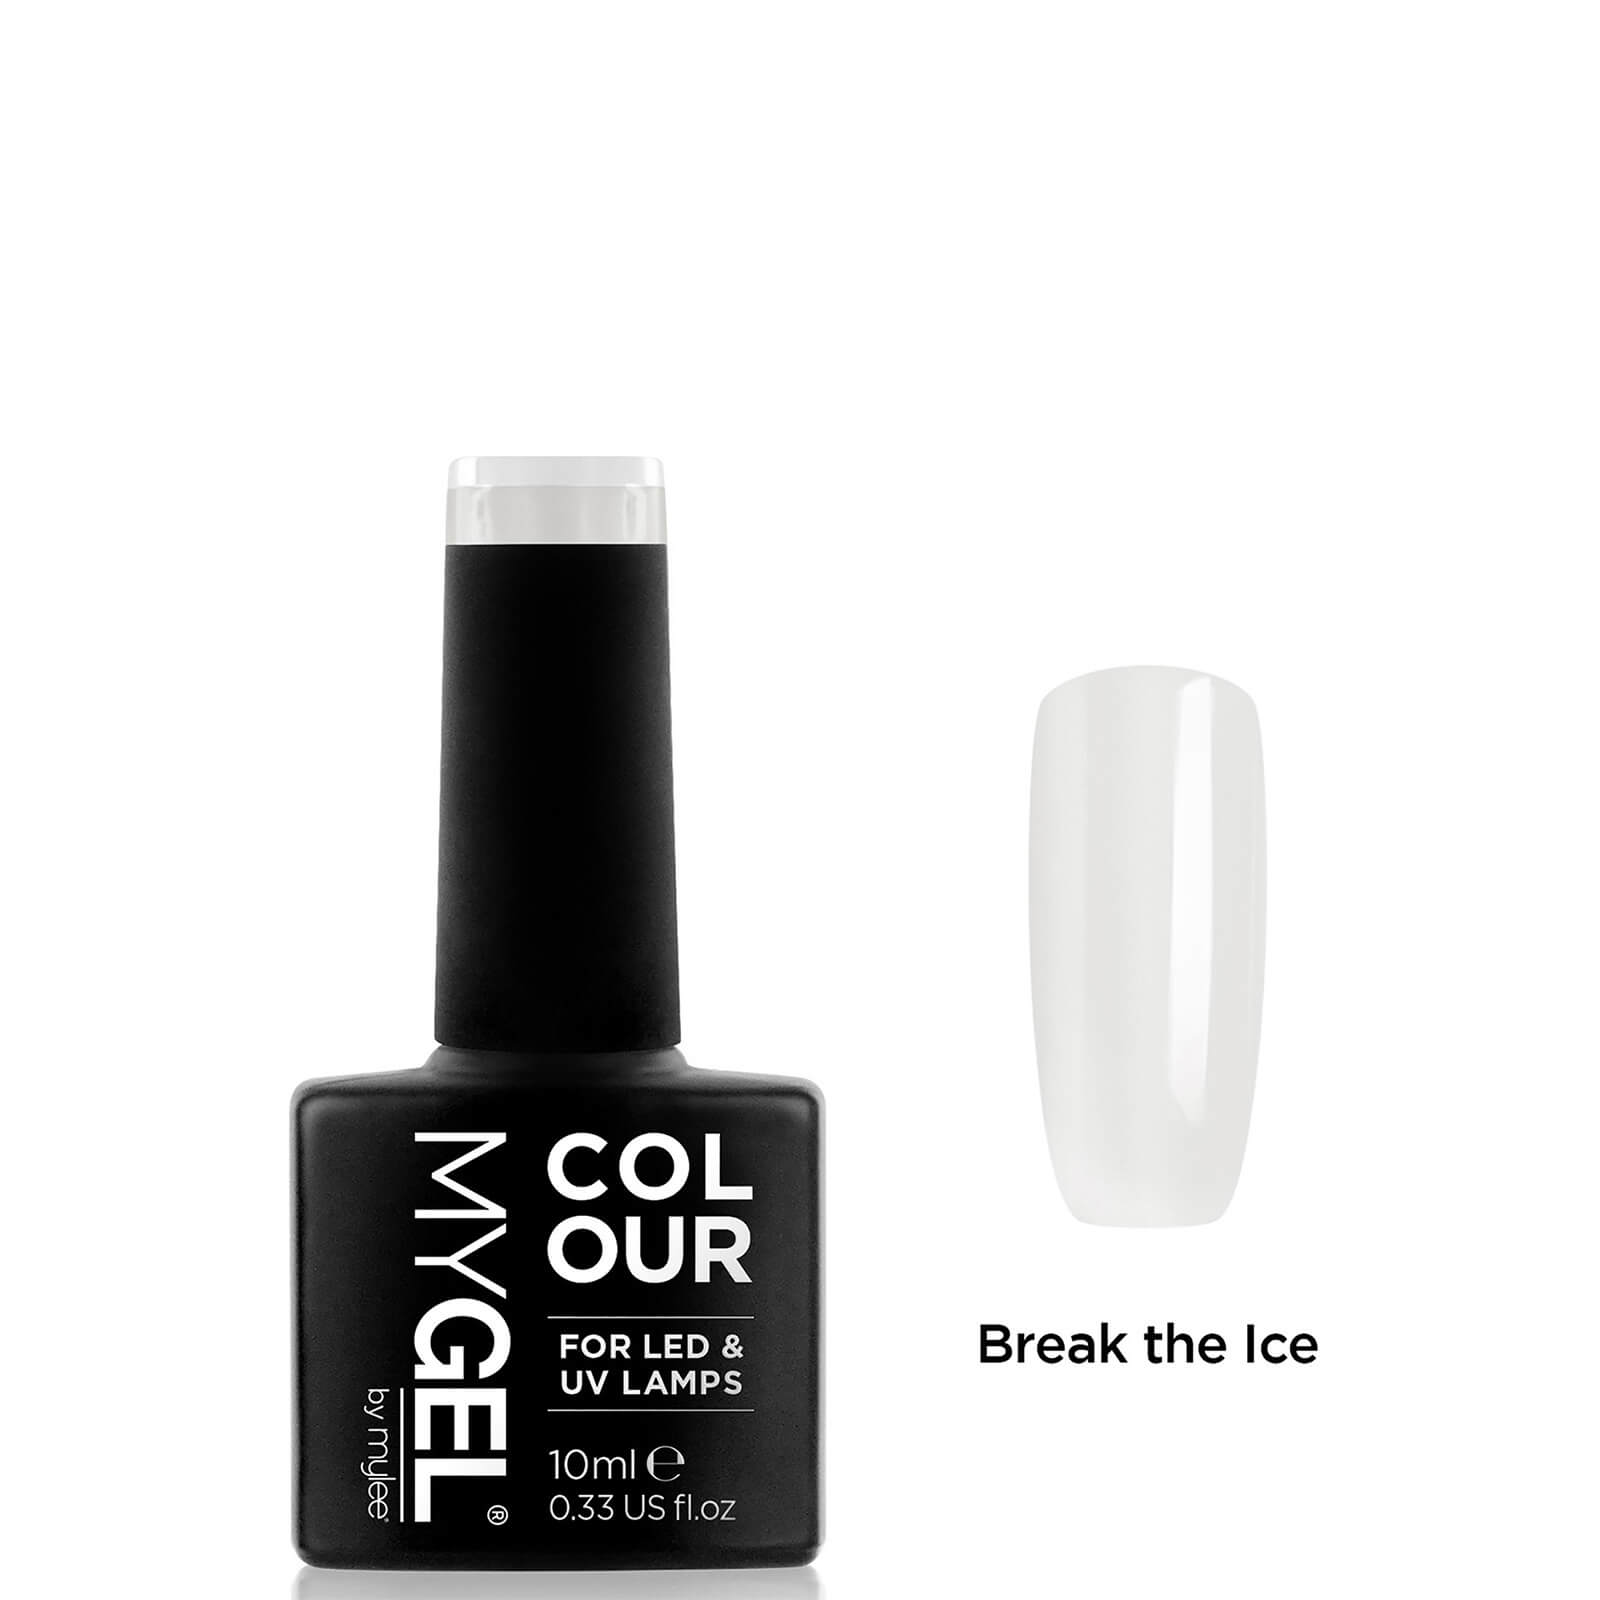 Mylee MYGEL Gel Polish 10ml (Various Shades) - Break the Ice